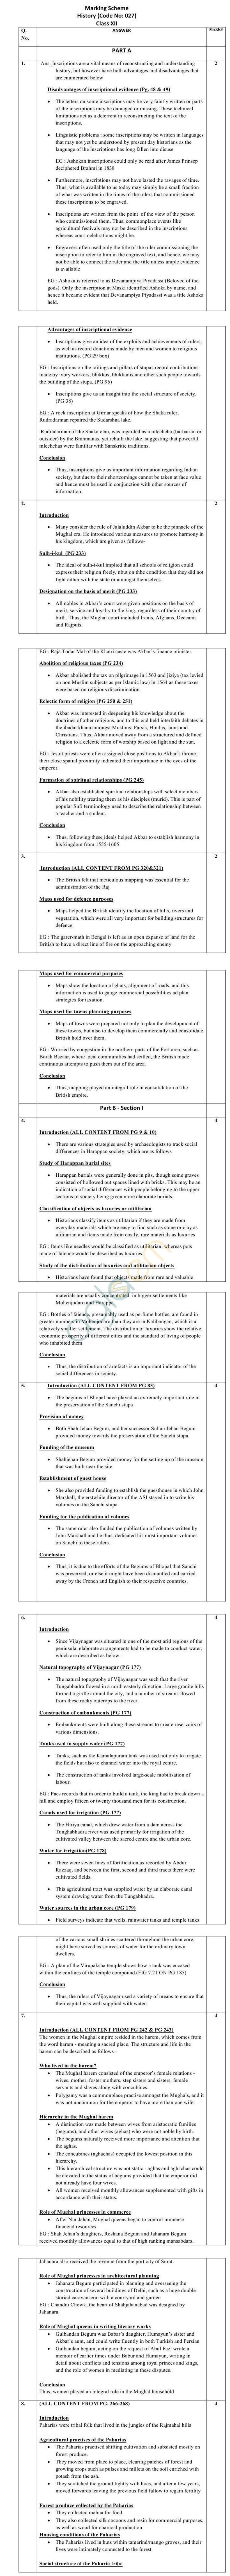 CBSE Class XII Marking Scheme 2015 History